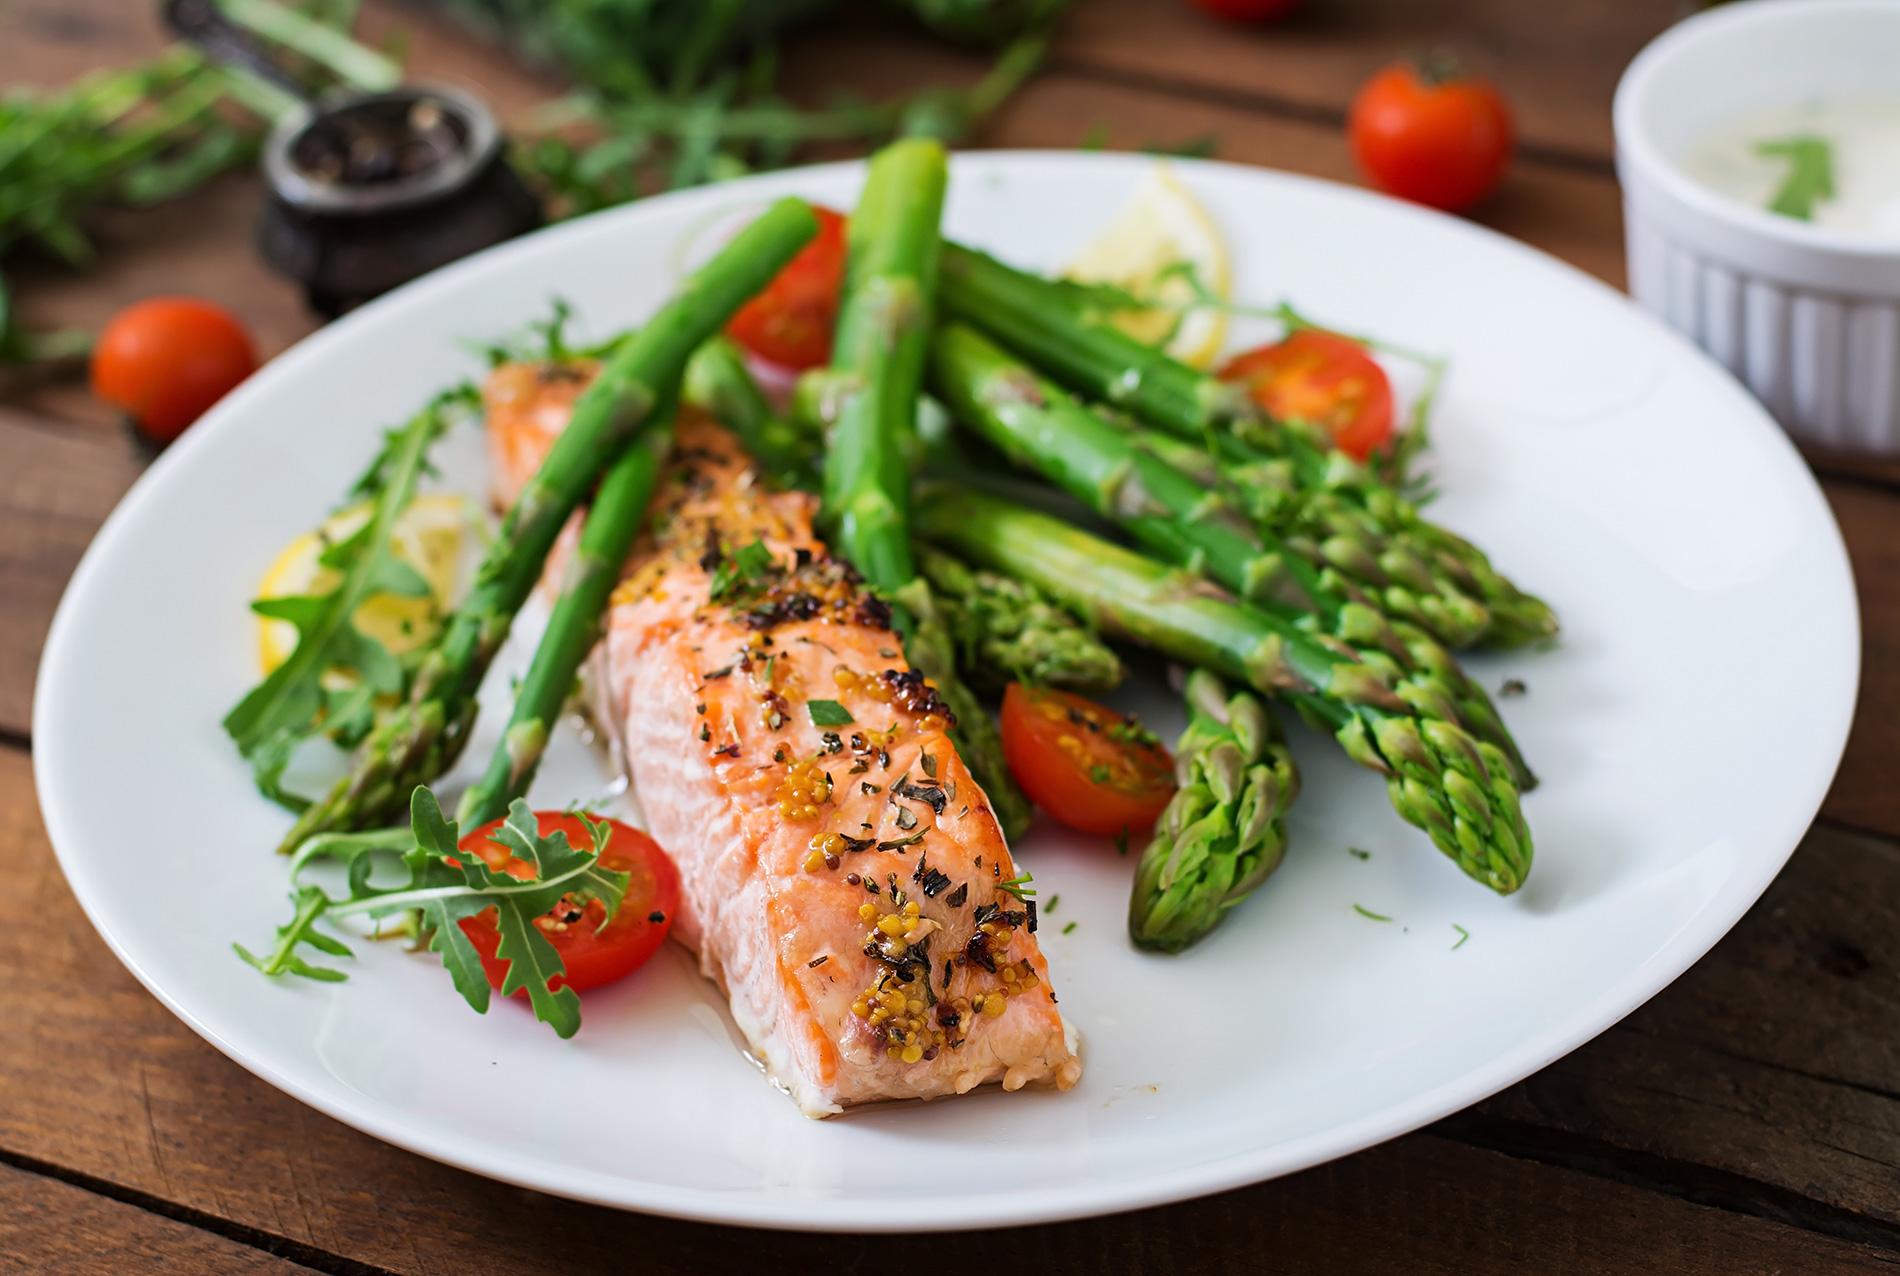 Ugnsstekt lax med sparris keto-diet